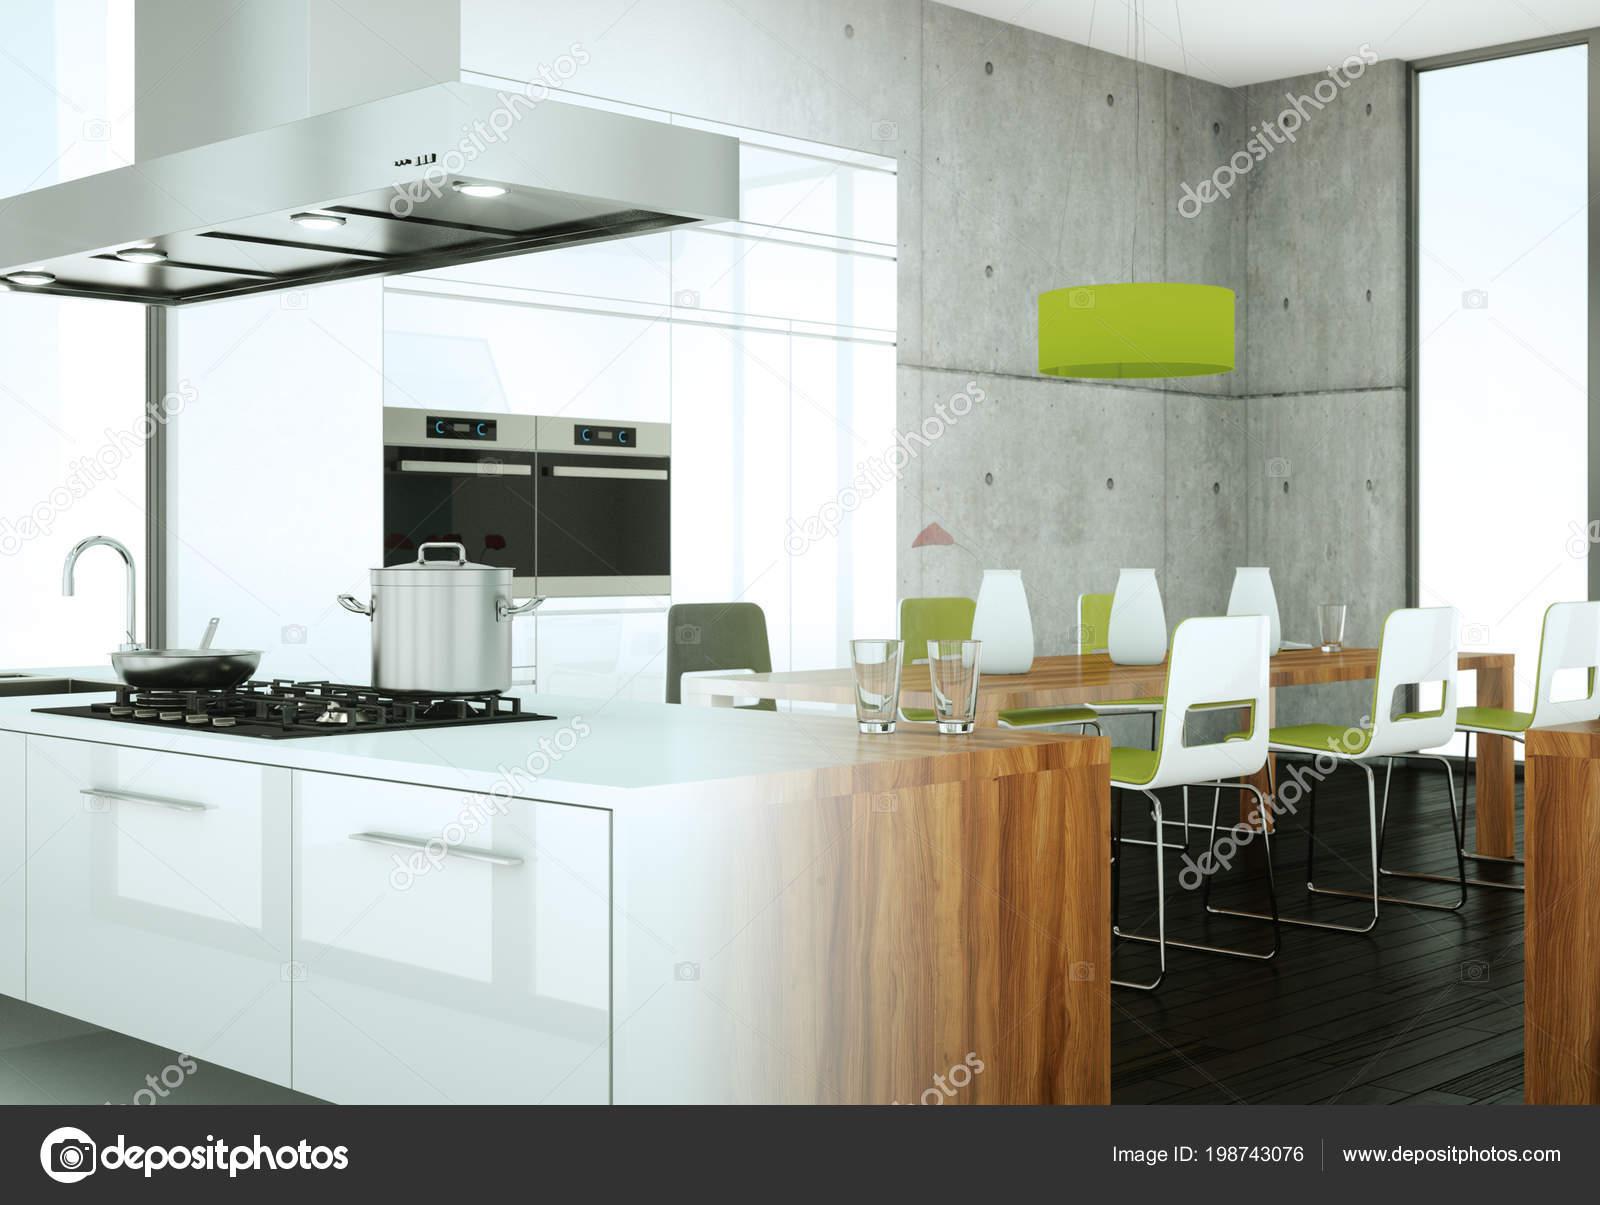 modern kitchen images granite top island 有混凝土墙的房子里的白色现代厨房 图库照片 c virtua73 198743076 3d 白色现代厨房的例证在一个房子用混凝土墙壁 照片作者virtua73